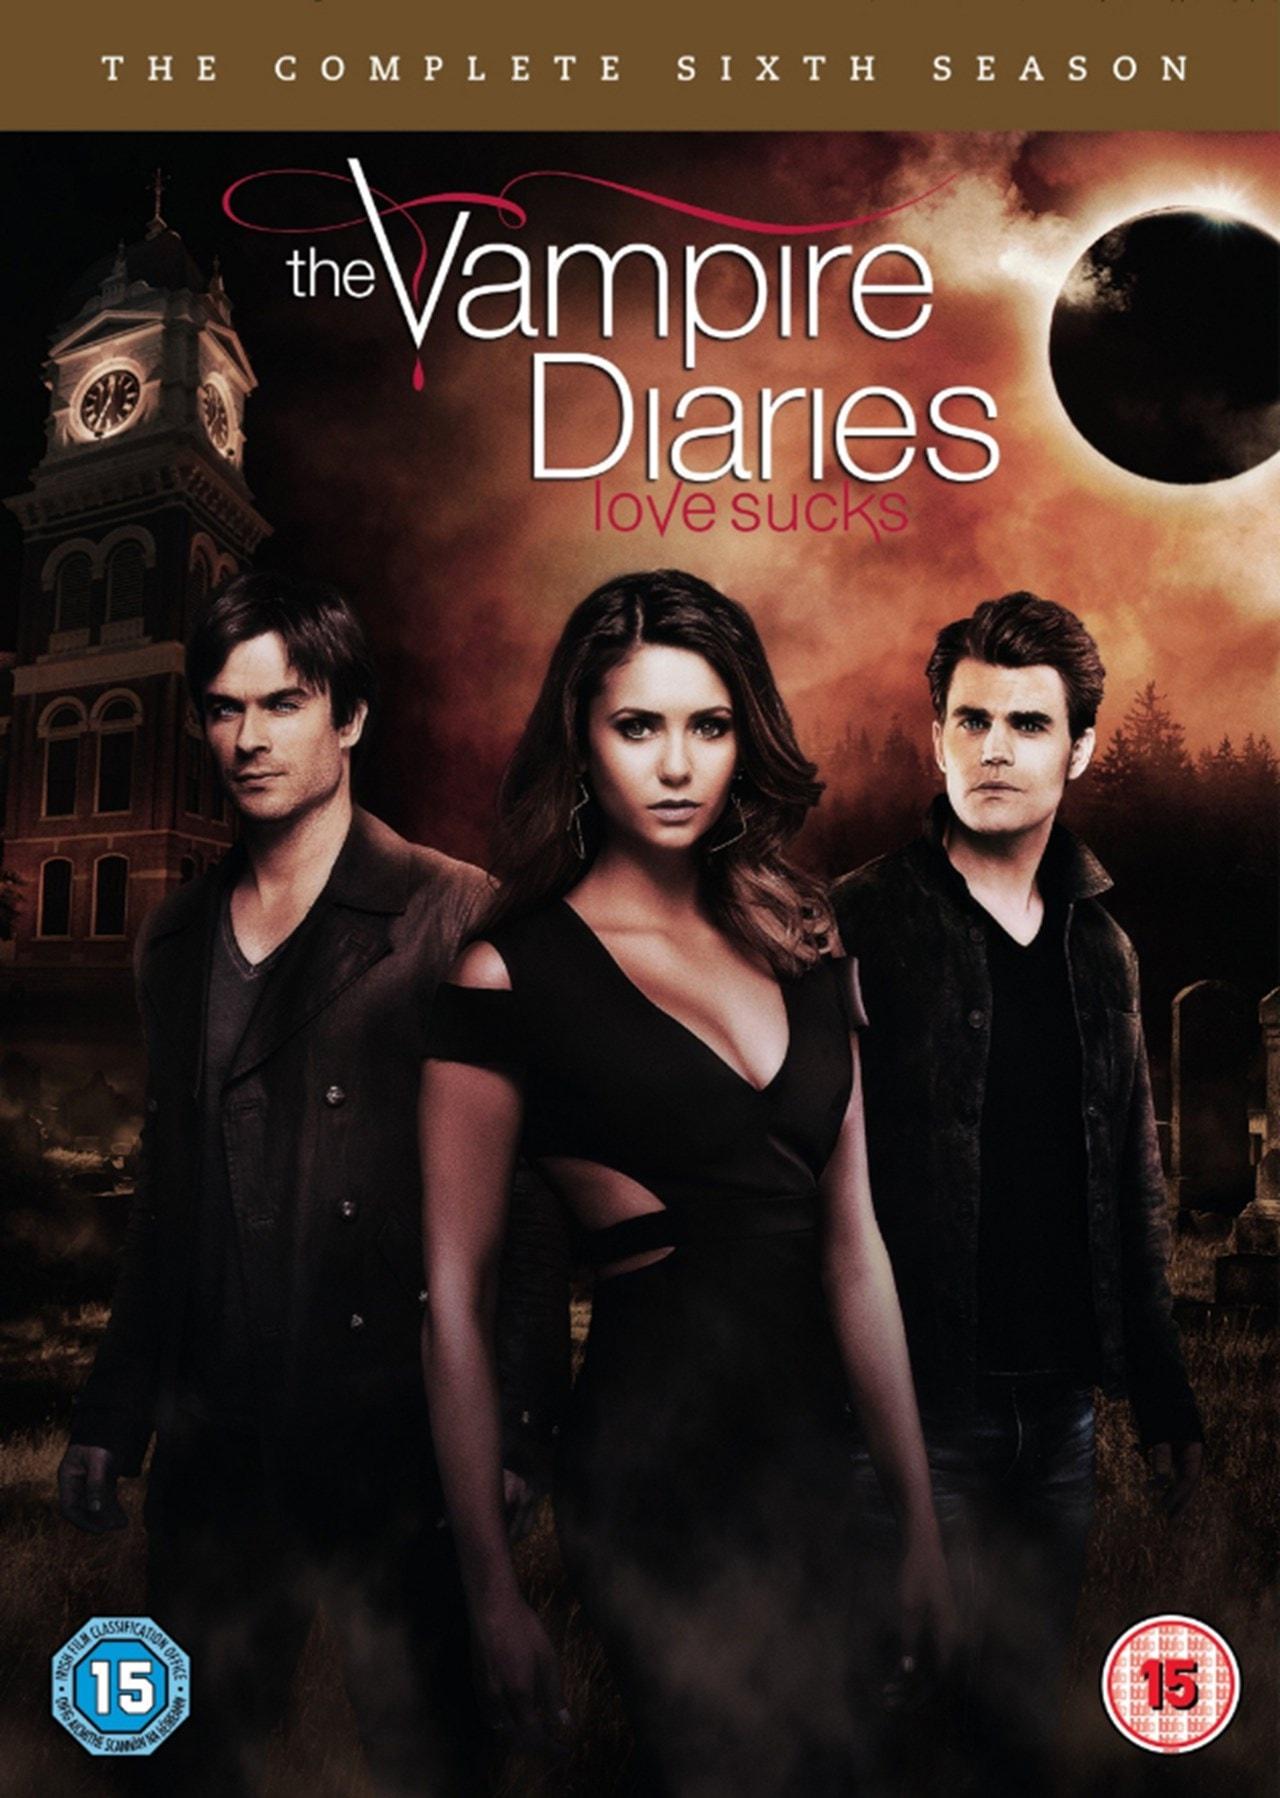 The Vampire Diaries: The Complete Sixth Season - 1